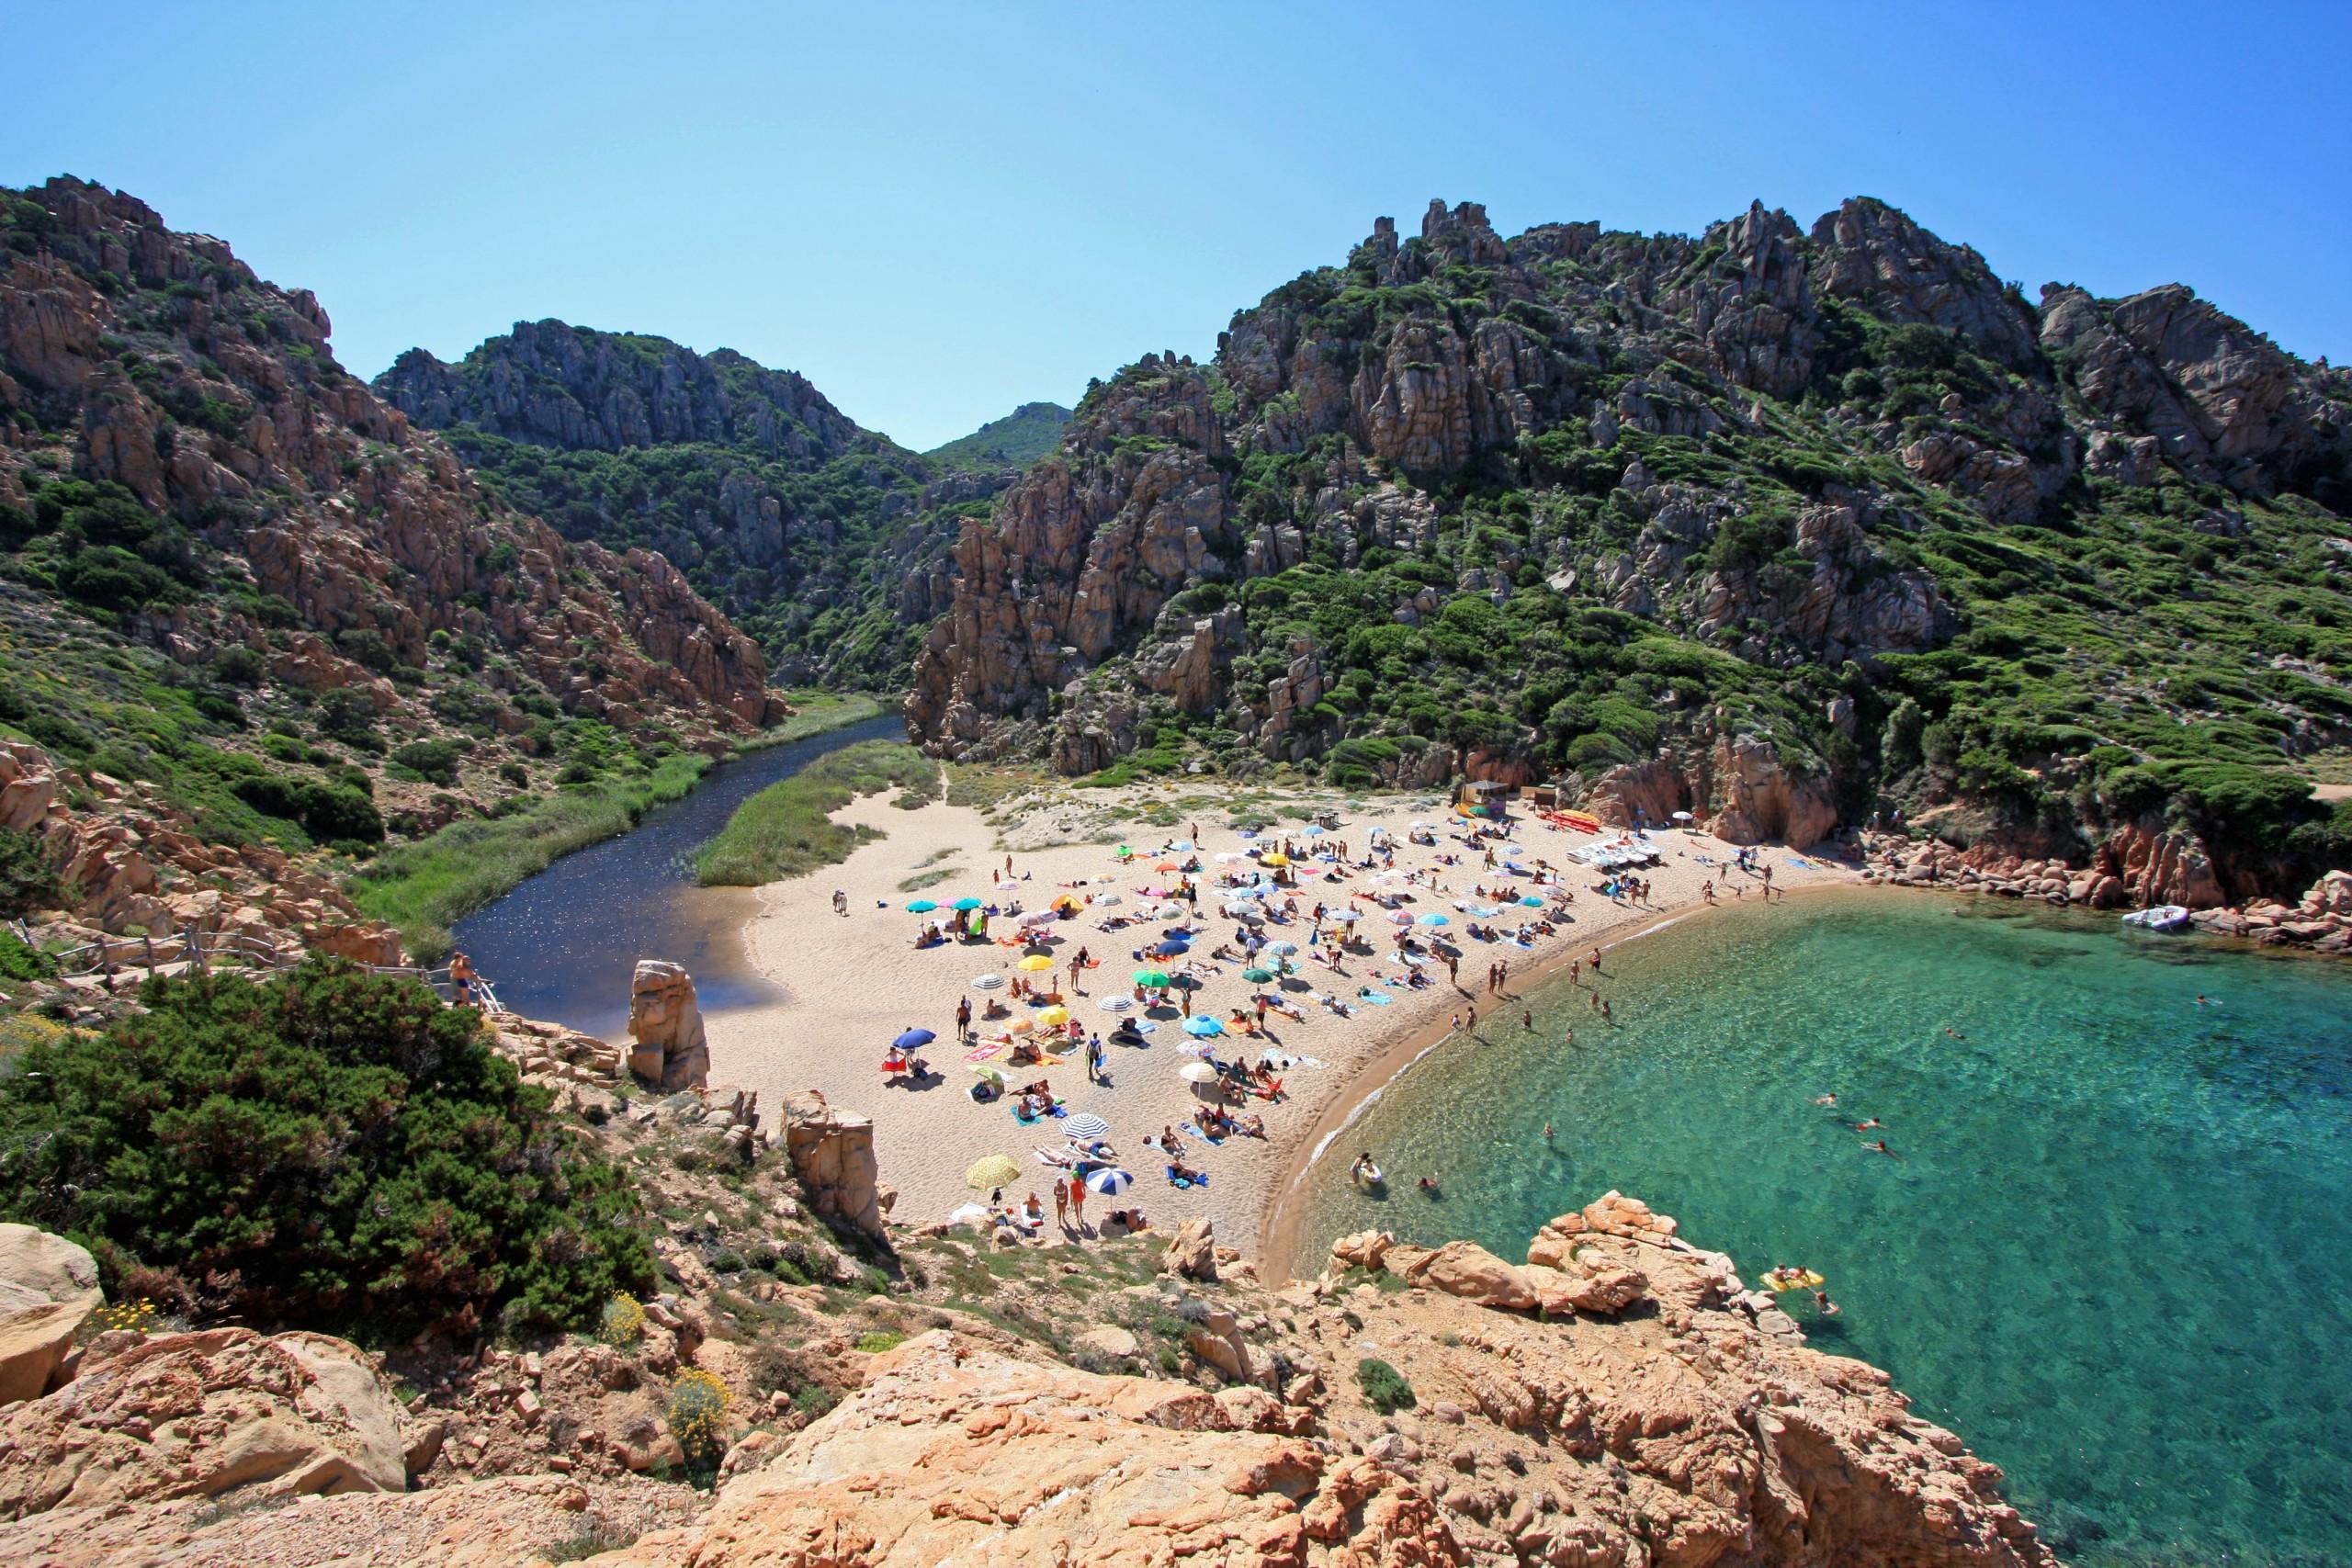 One of the Beautiful beaches of Costa Smeralda